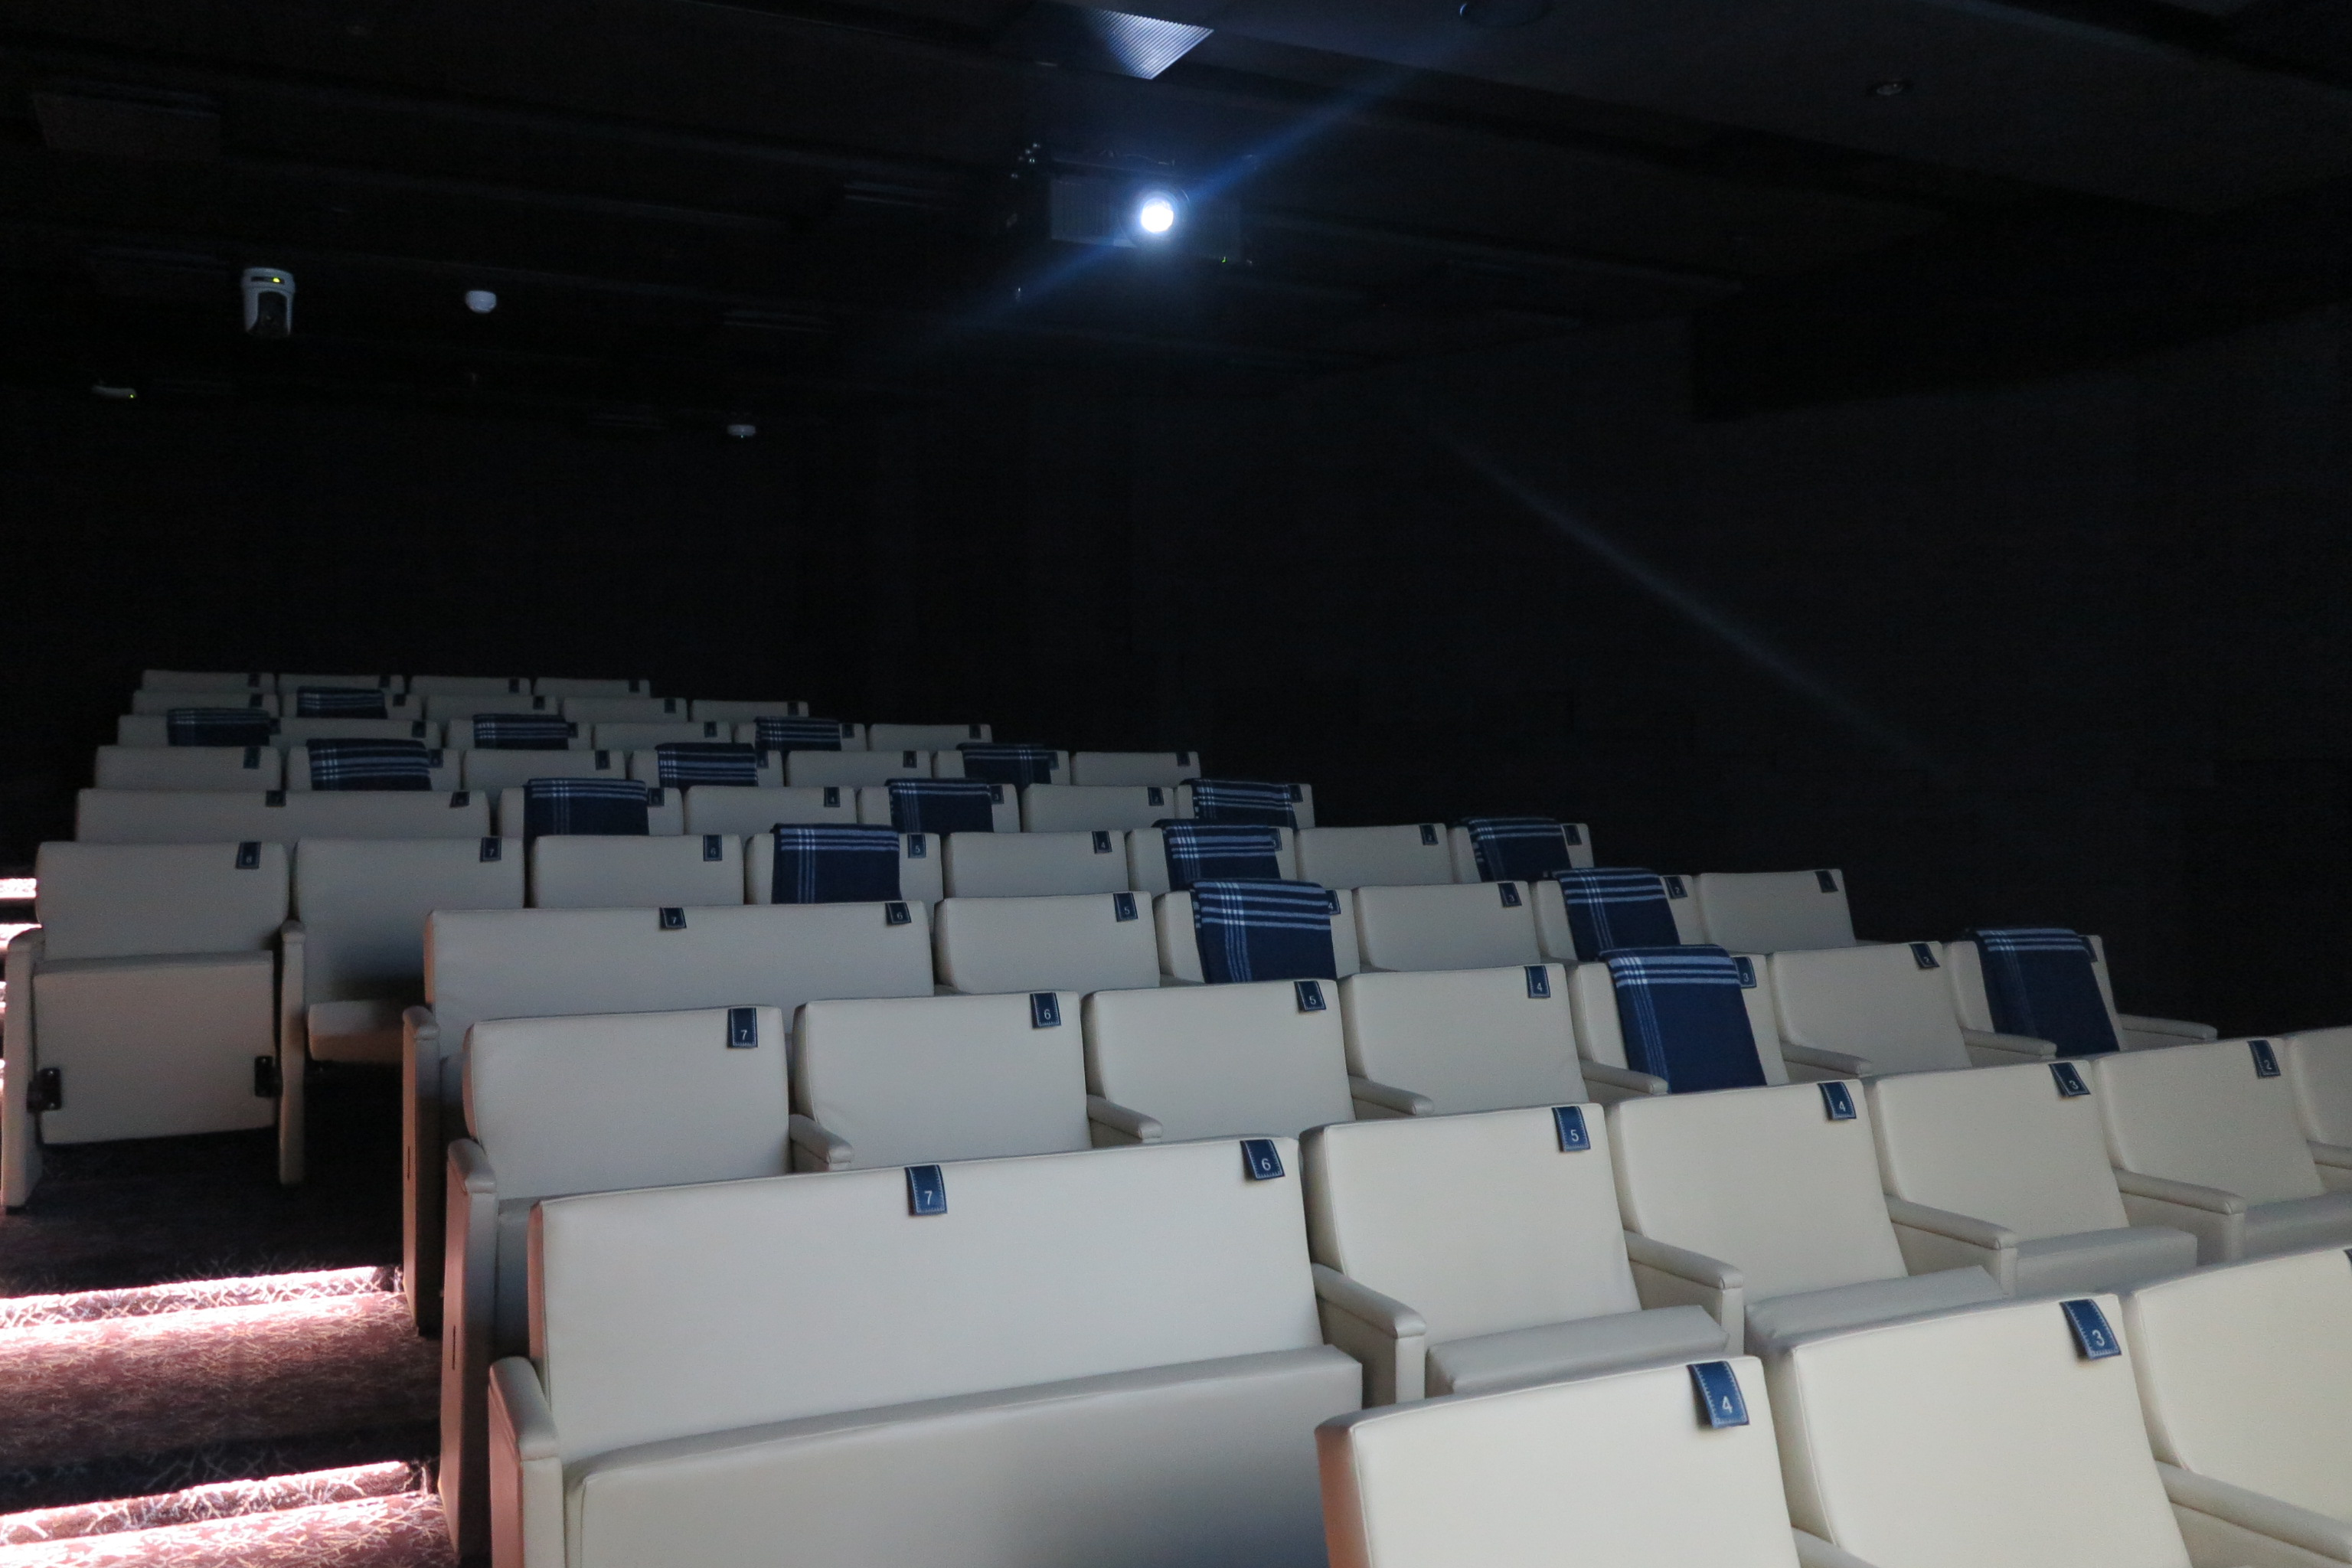 Big screen: The cinema